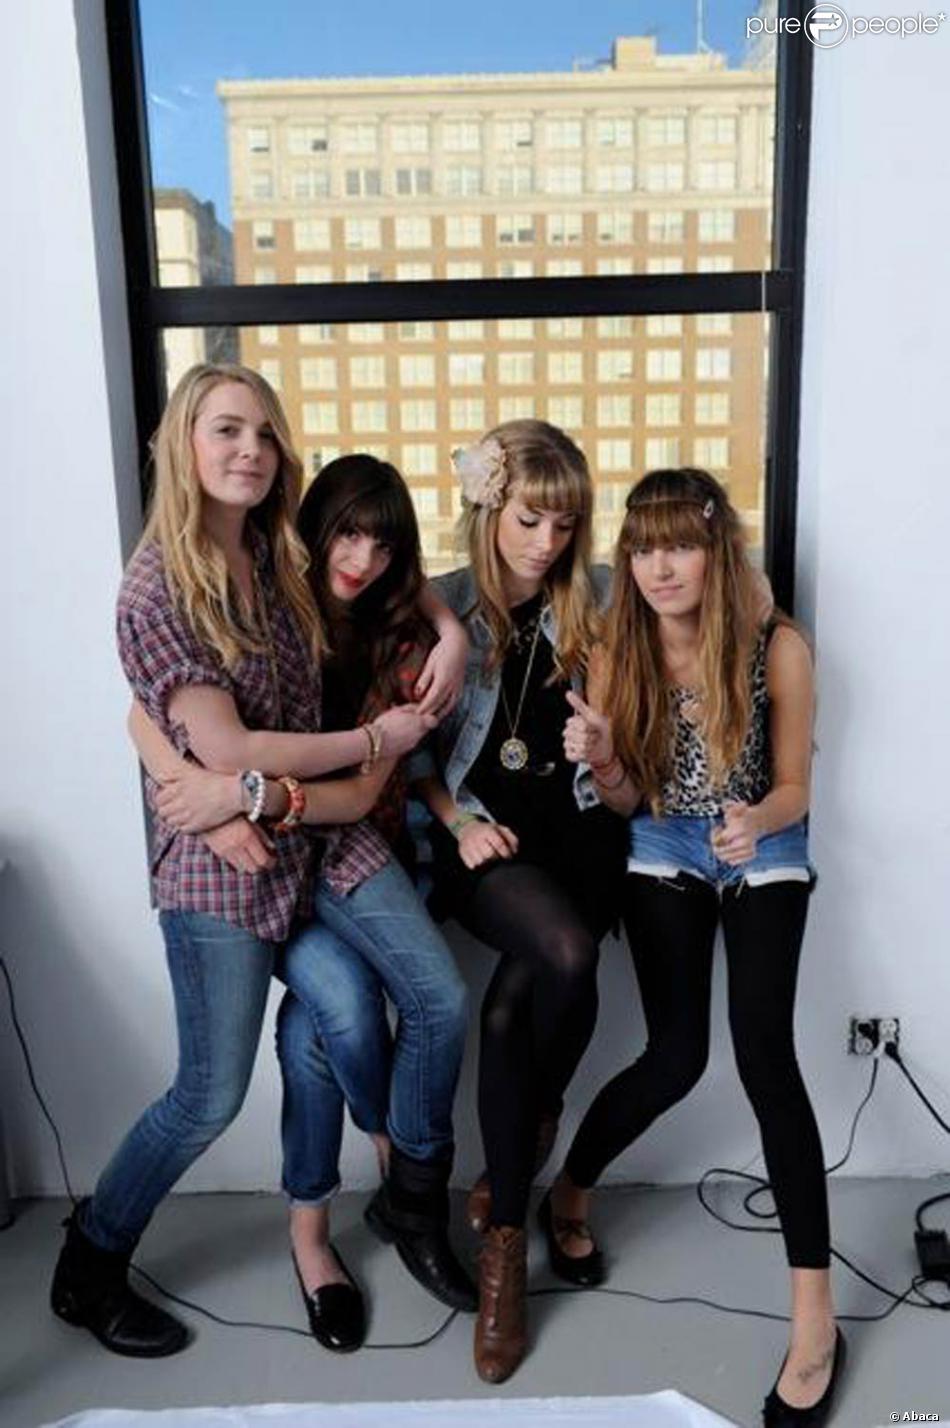 School girls de france p2 - 3 6